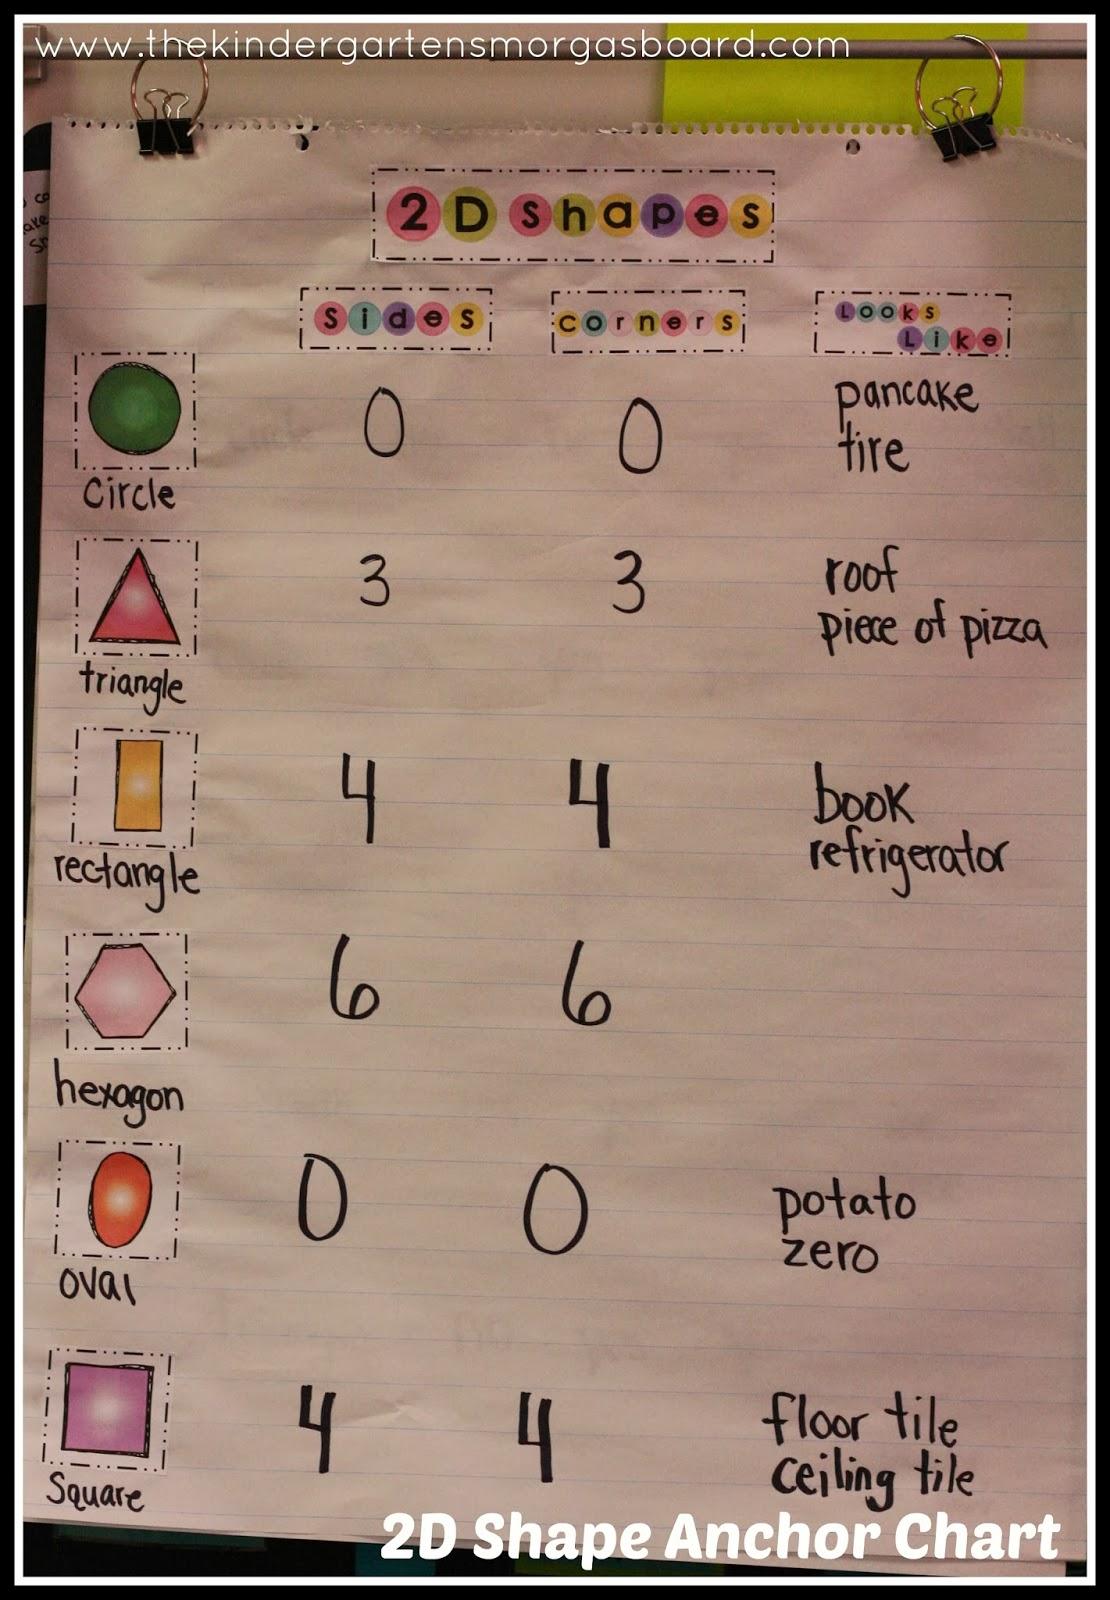 The Kindergarten Smorgasboard A Kindergarten Smorgasboard Of Shapes